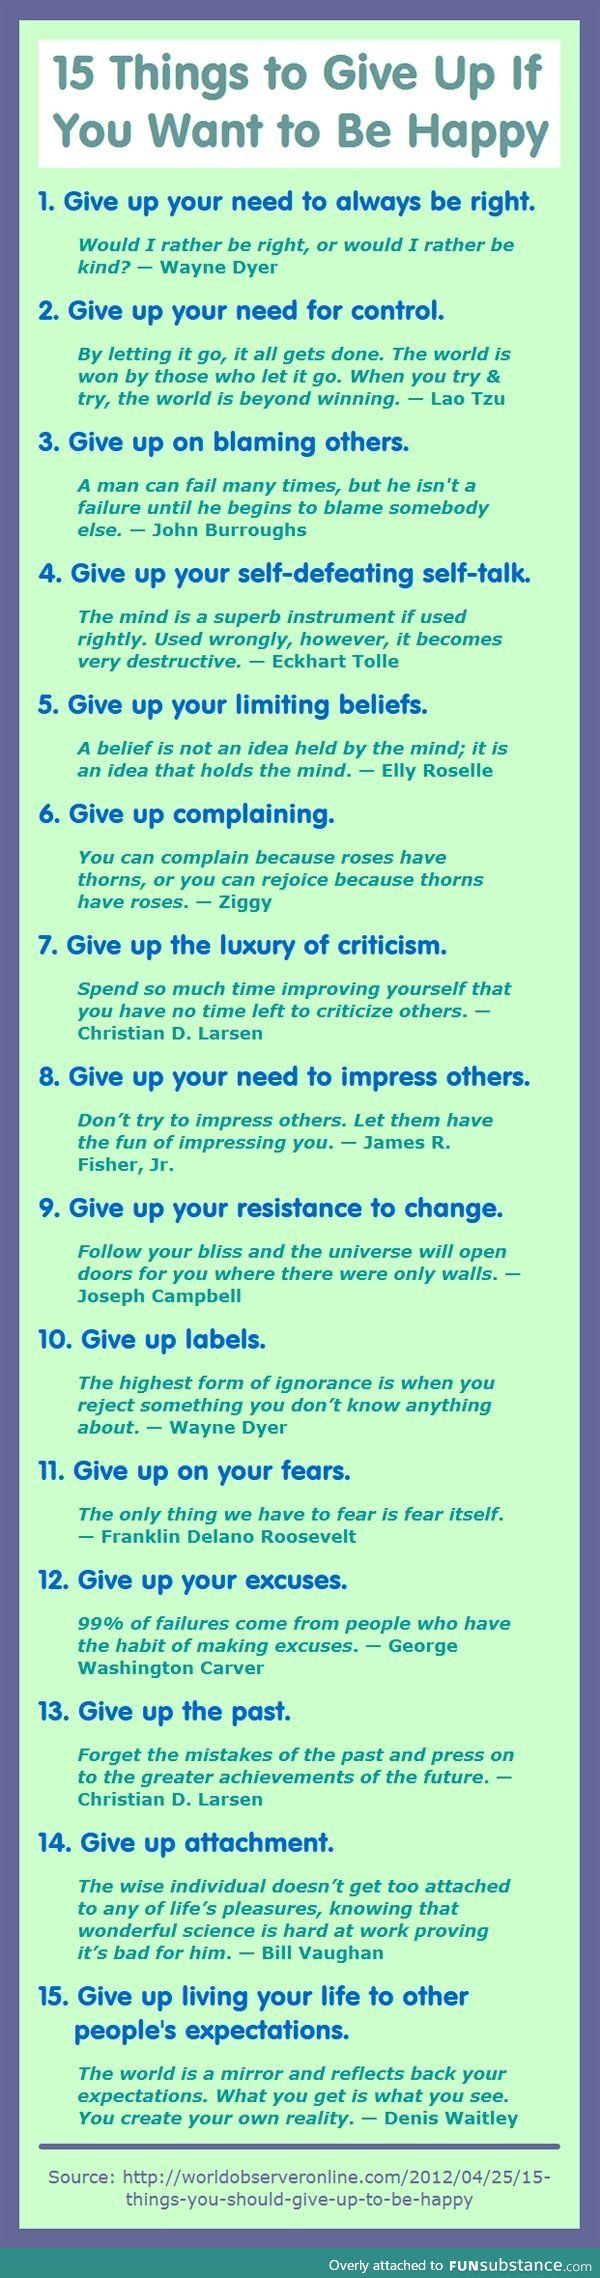 Some good life advice